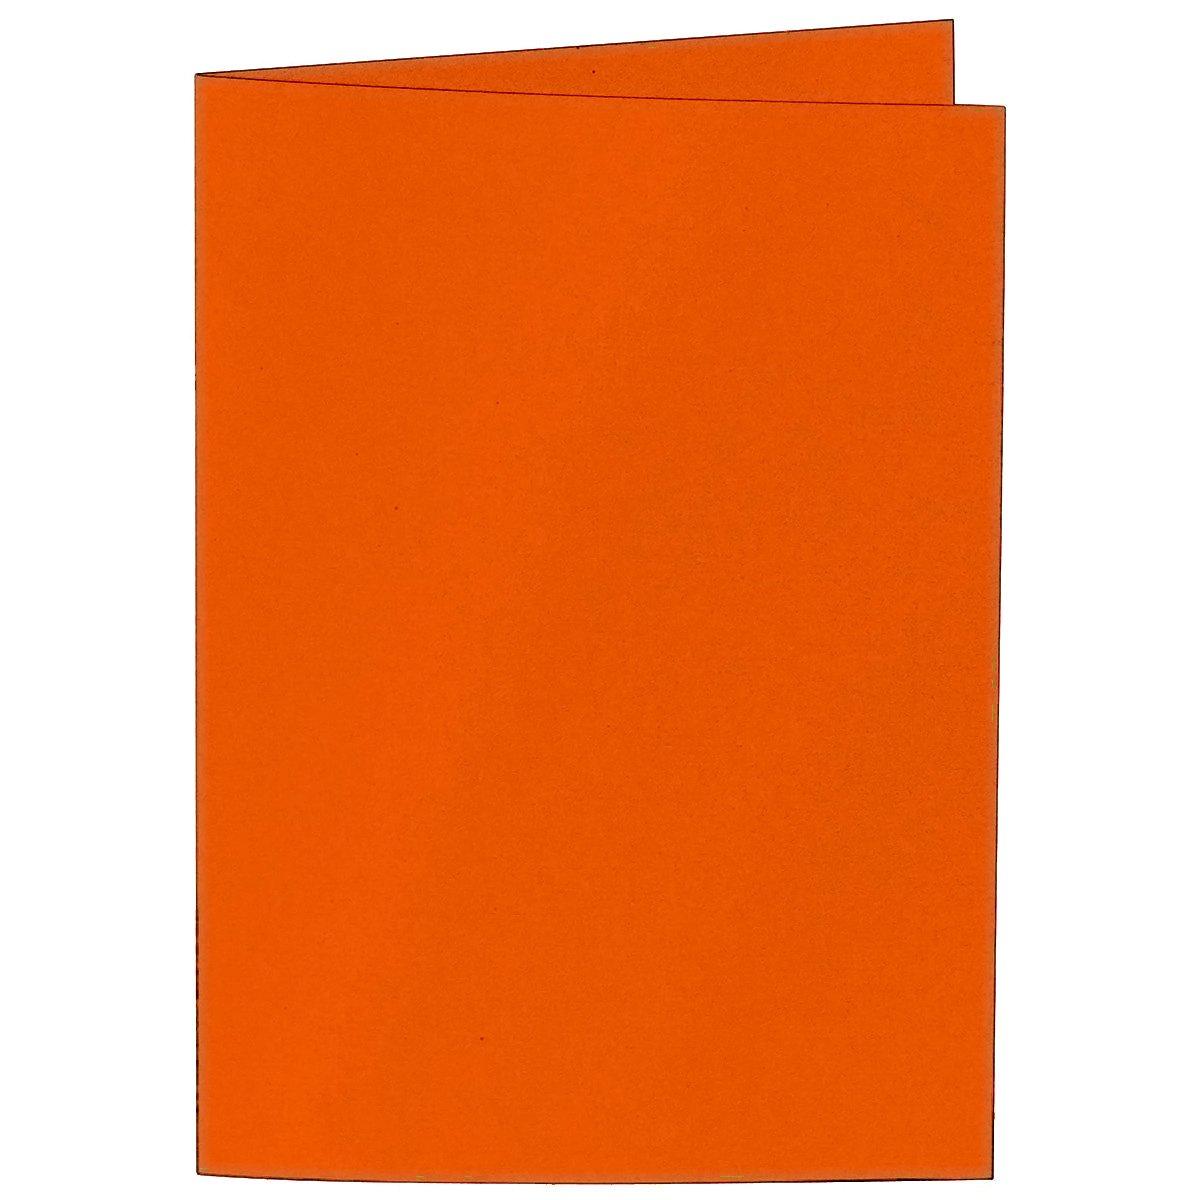 50 pieza//Artoz Serie 1001 doble doble doble Tarjetas acanalados.//hochdo ppelt//DIN A5, 297 x 210 mm, de gran calidad, Mandarin 9038b5